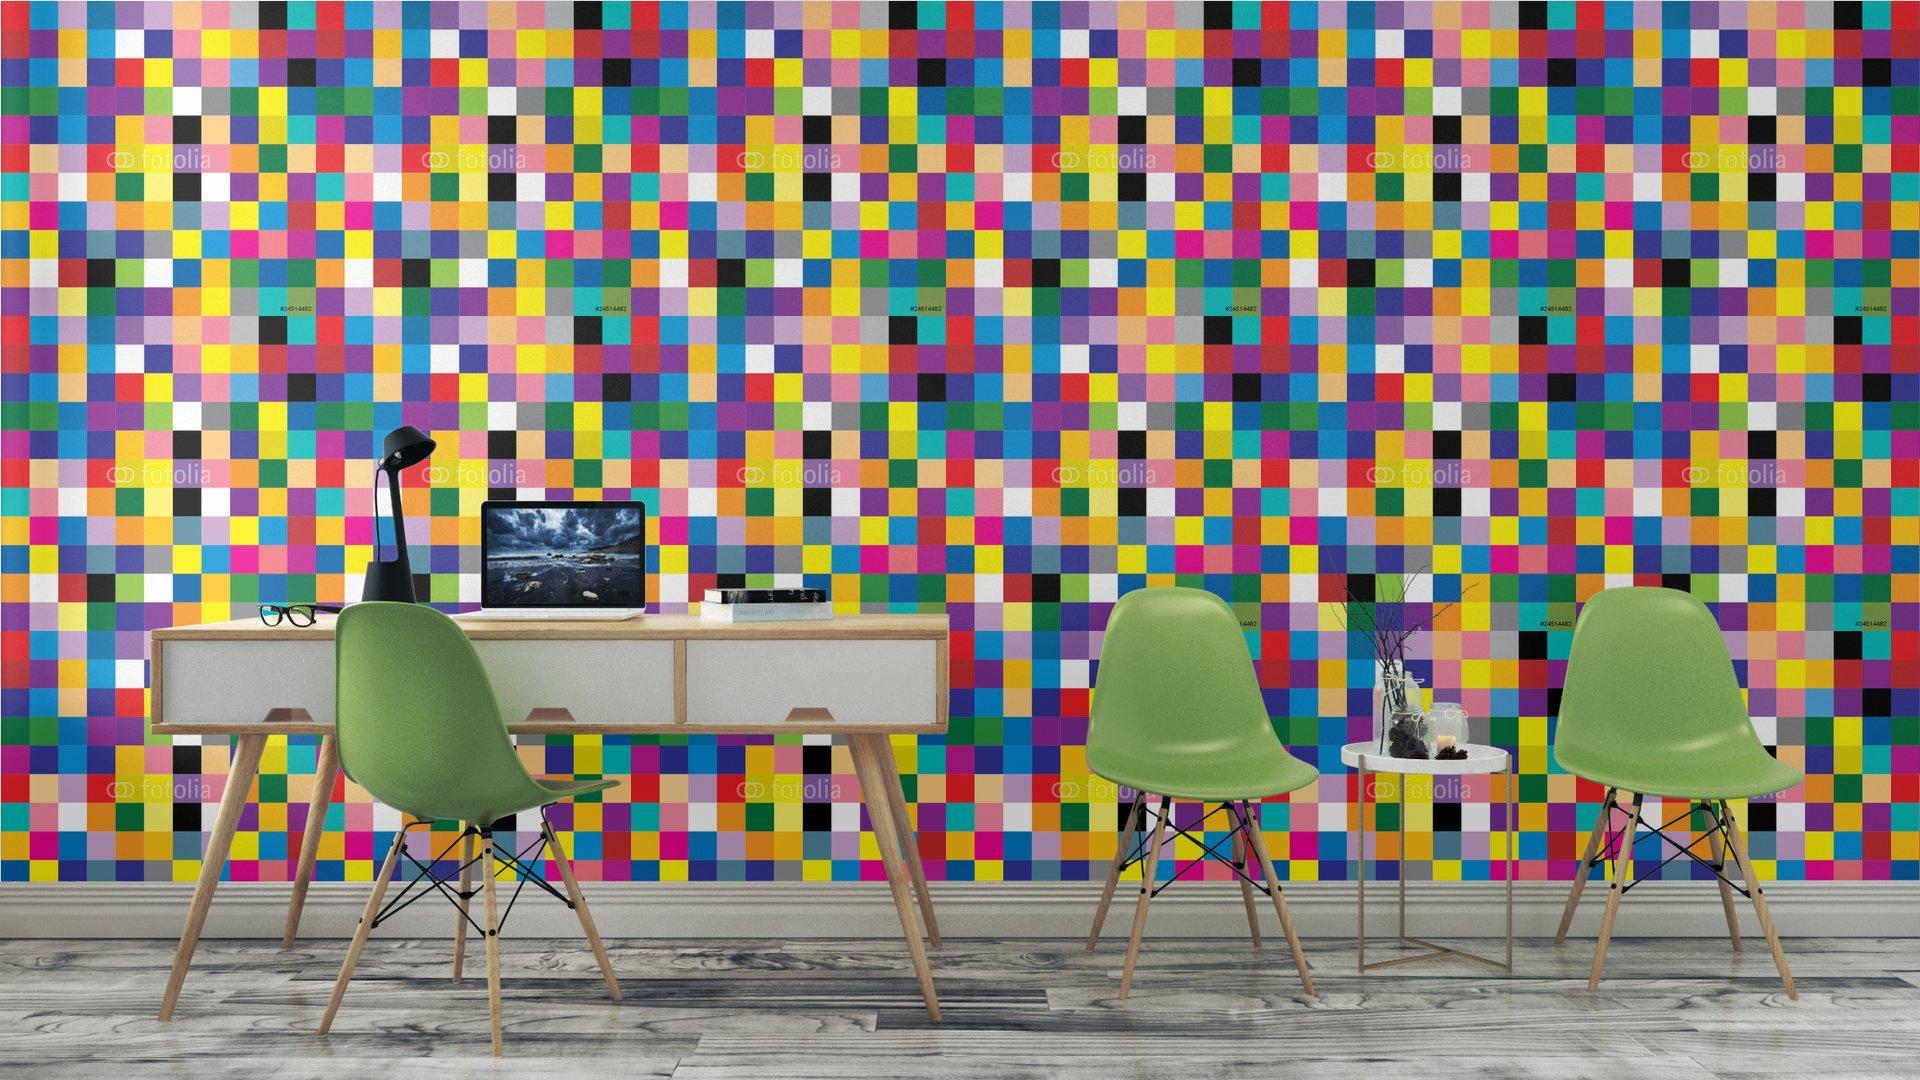 Fotomurales mexico papeles pintados abstracto cuadrado 7 - PapelTapizAbstracto Cuadros de Colores 01